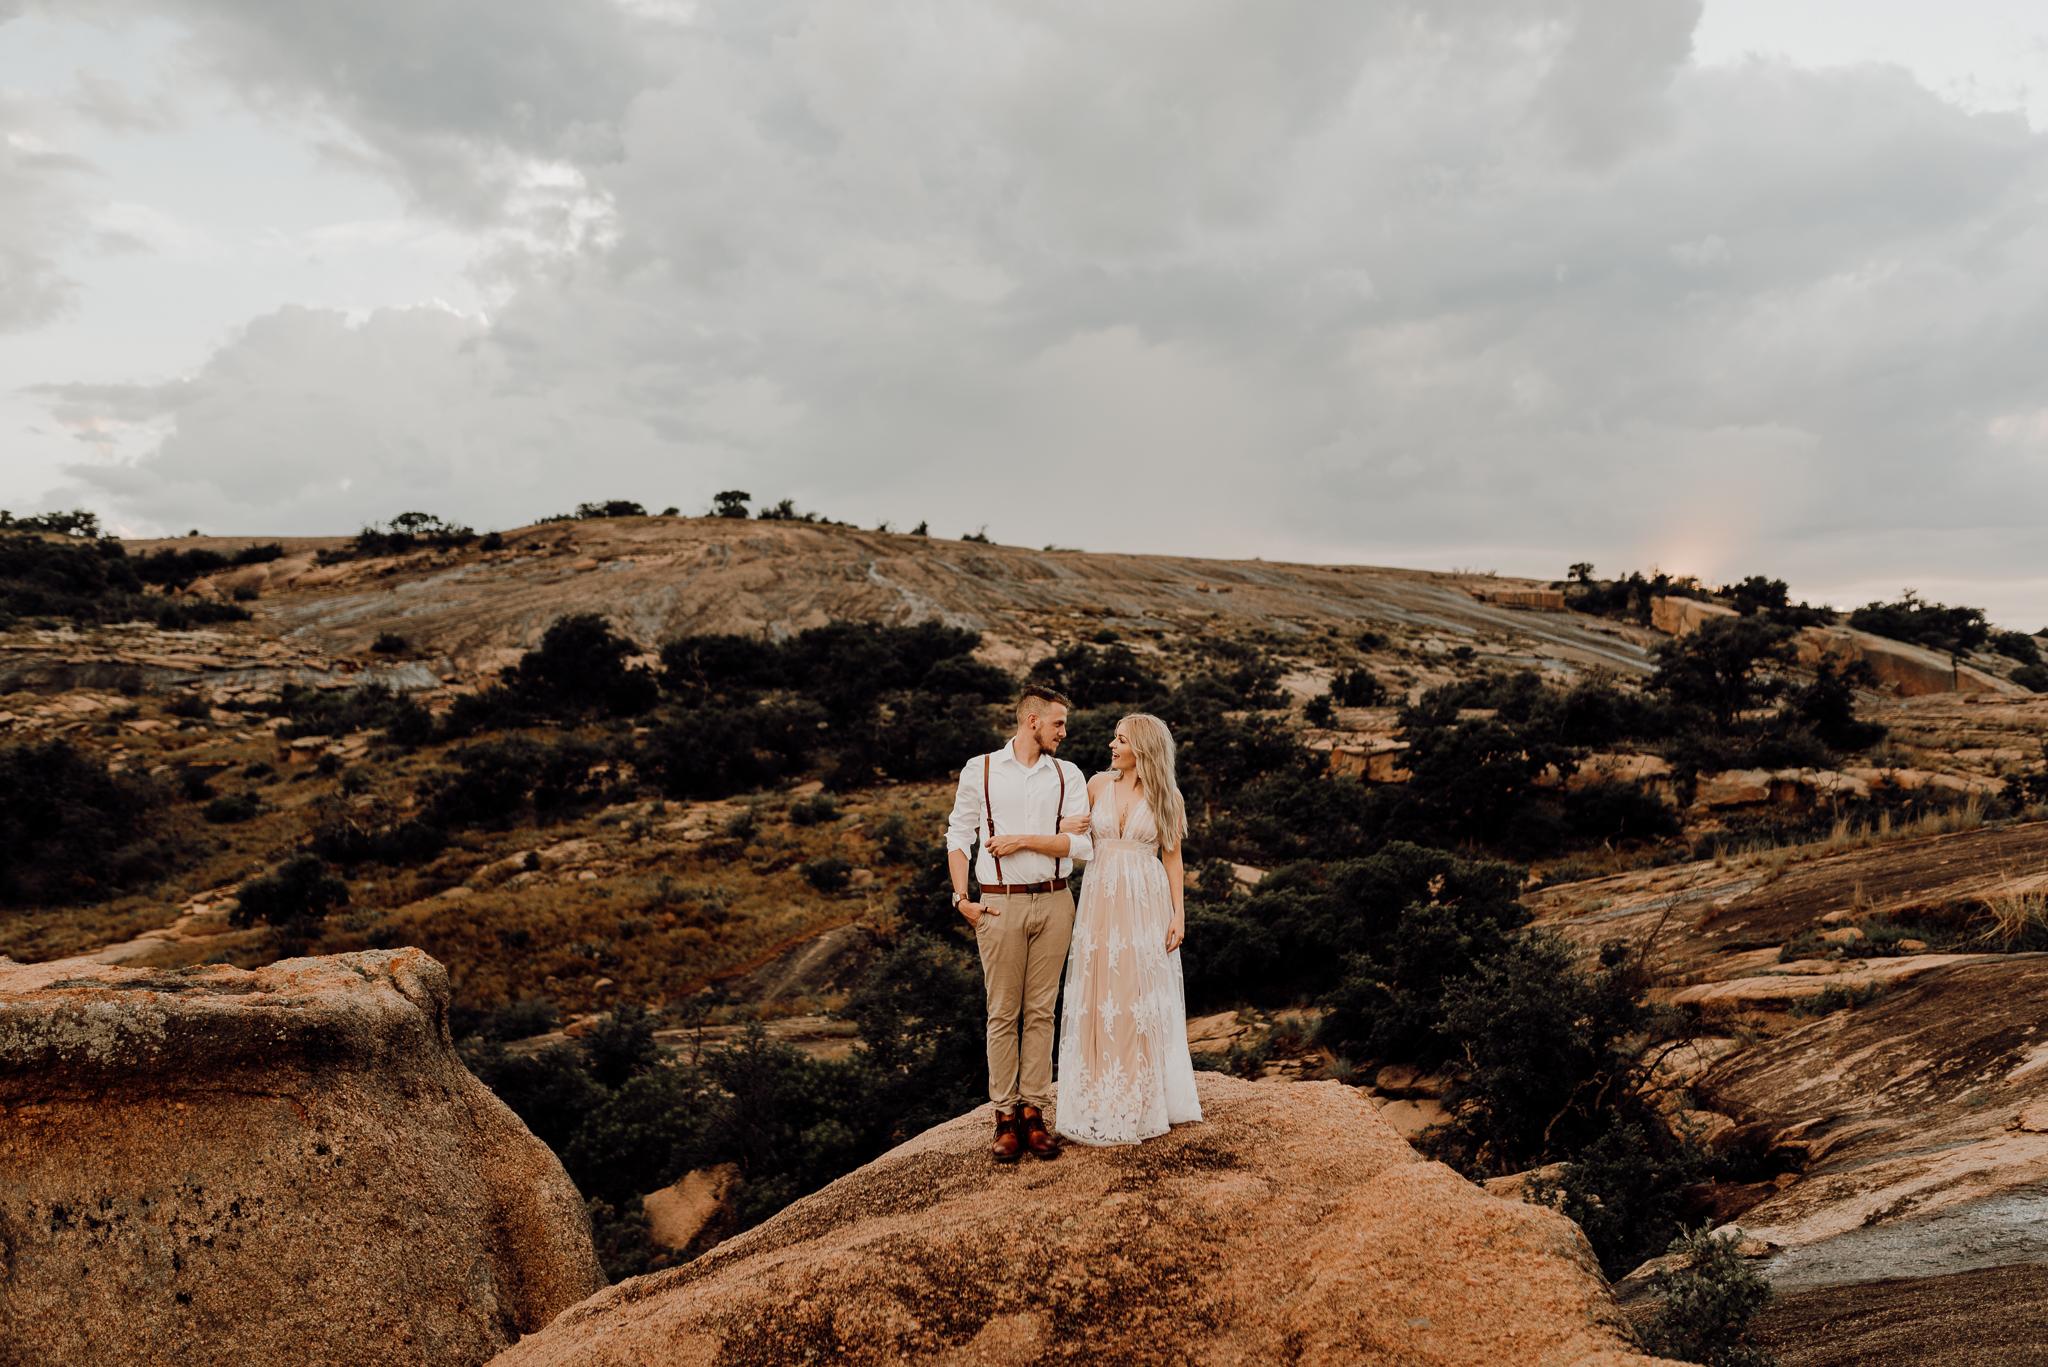 texas-elopement-photographer-enchanted-rock-46-blog.jpg